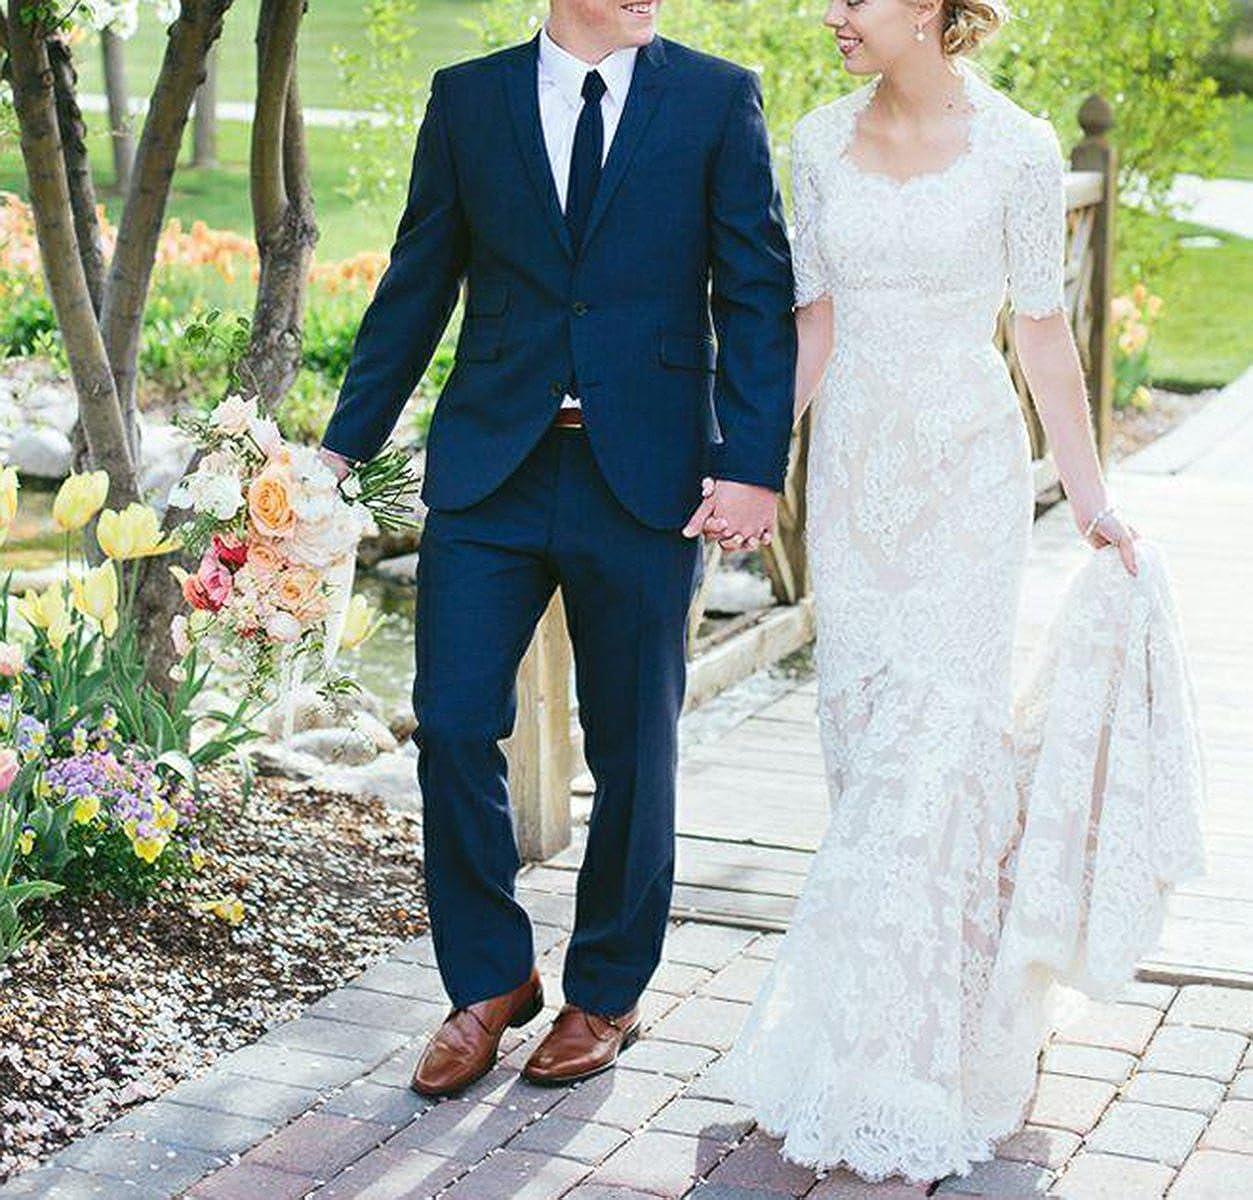 Western Wedding Dresses.Vikdressy Women S Full Lace Sheath Country Western Wedding